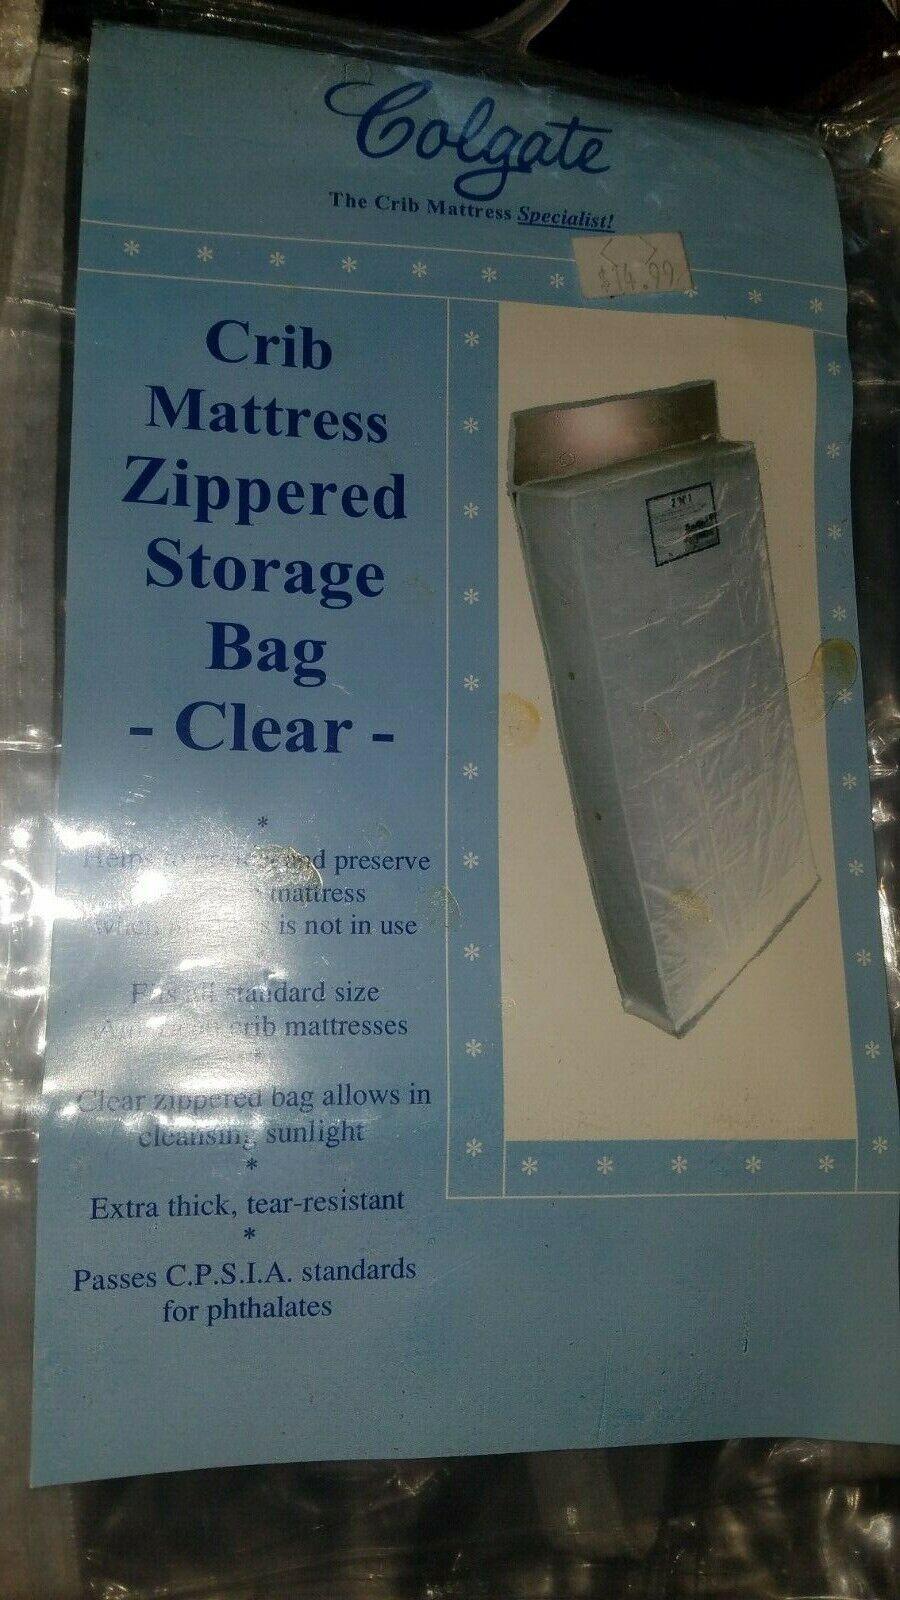 Colgate Zippered Crib Mattress Storage Bag, Waterproof, Dura